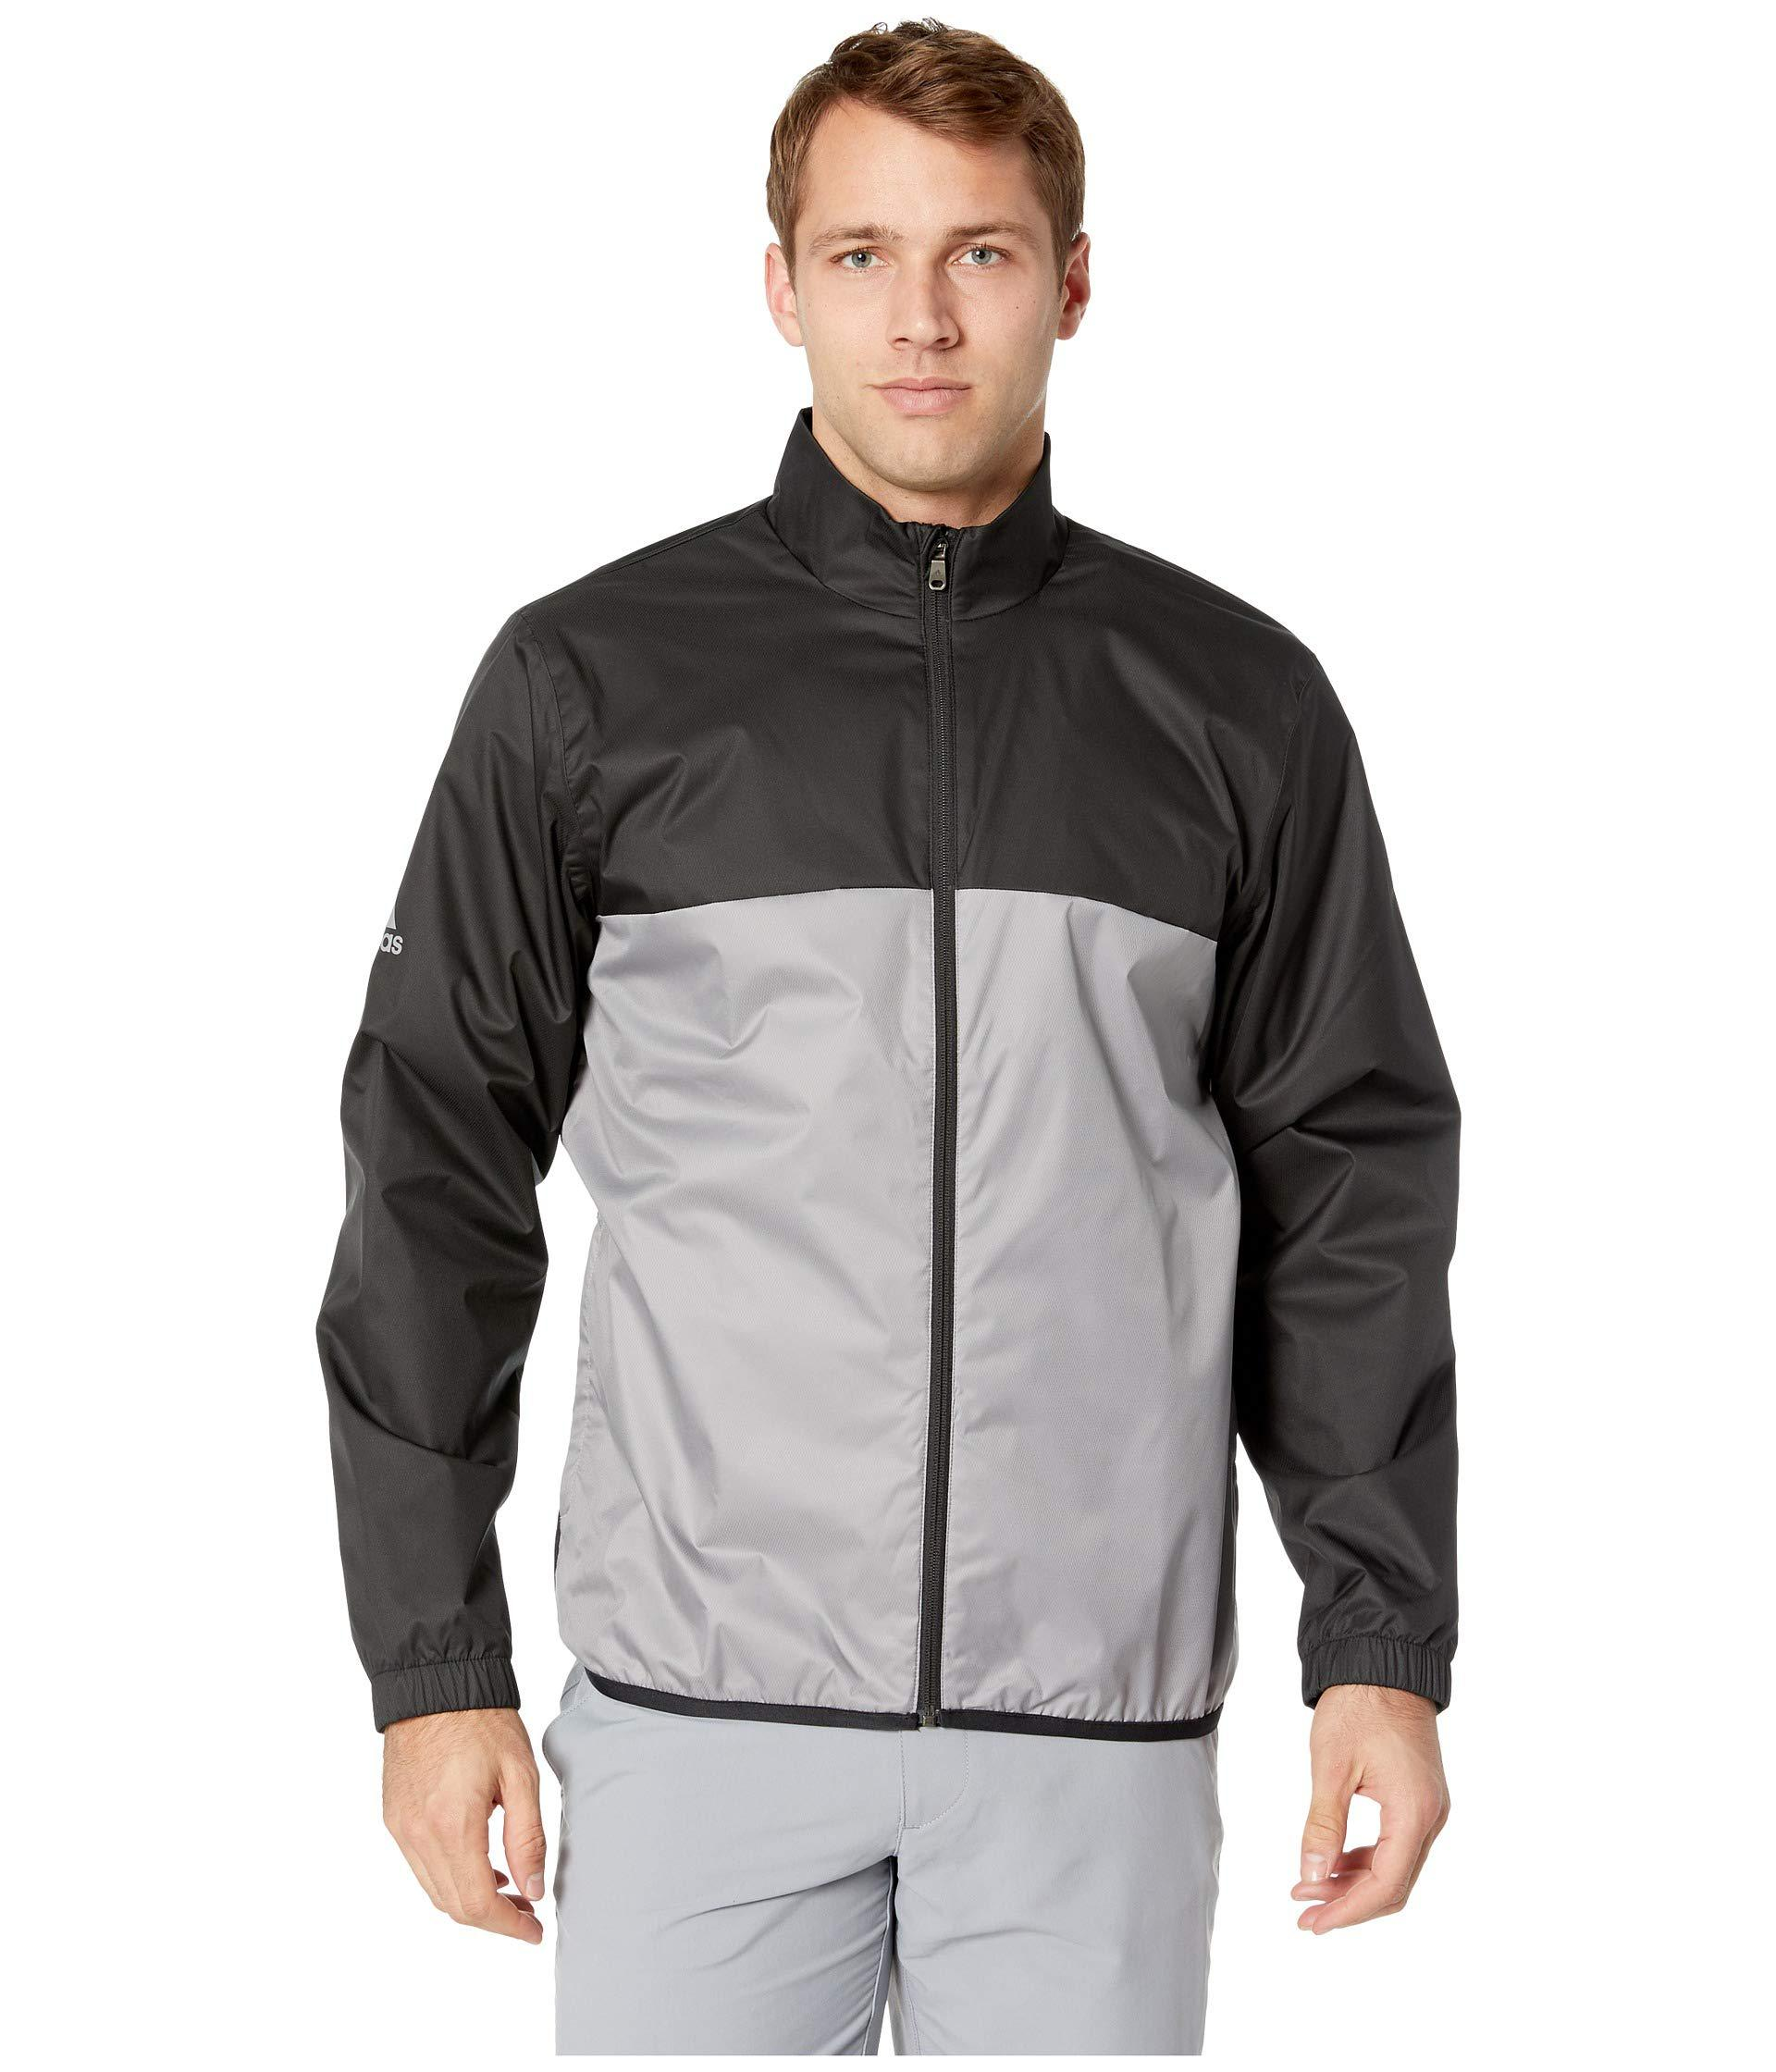 Lyst Adidas Originals Climastorm Provisional Rain Jacket White